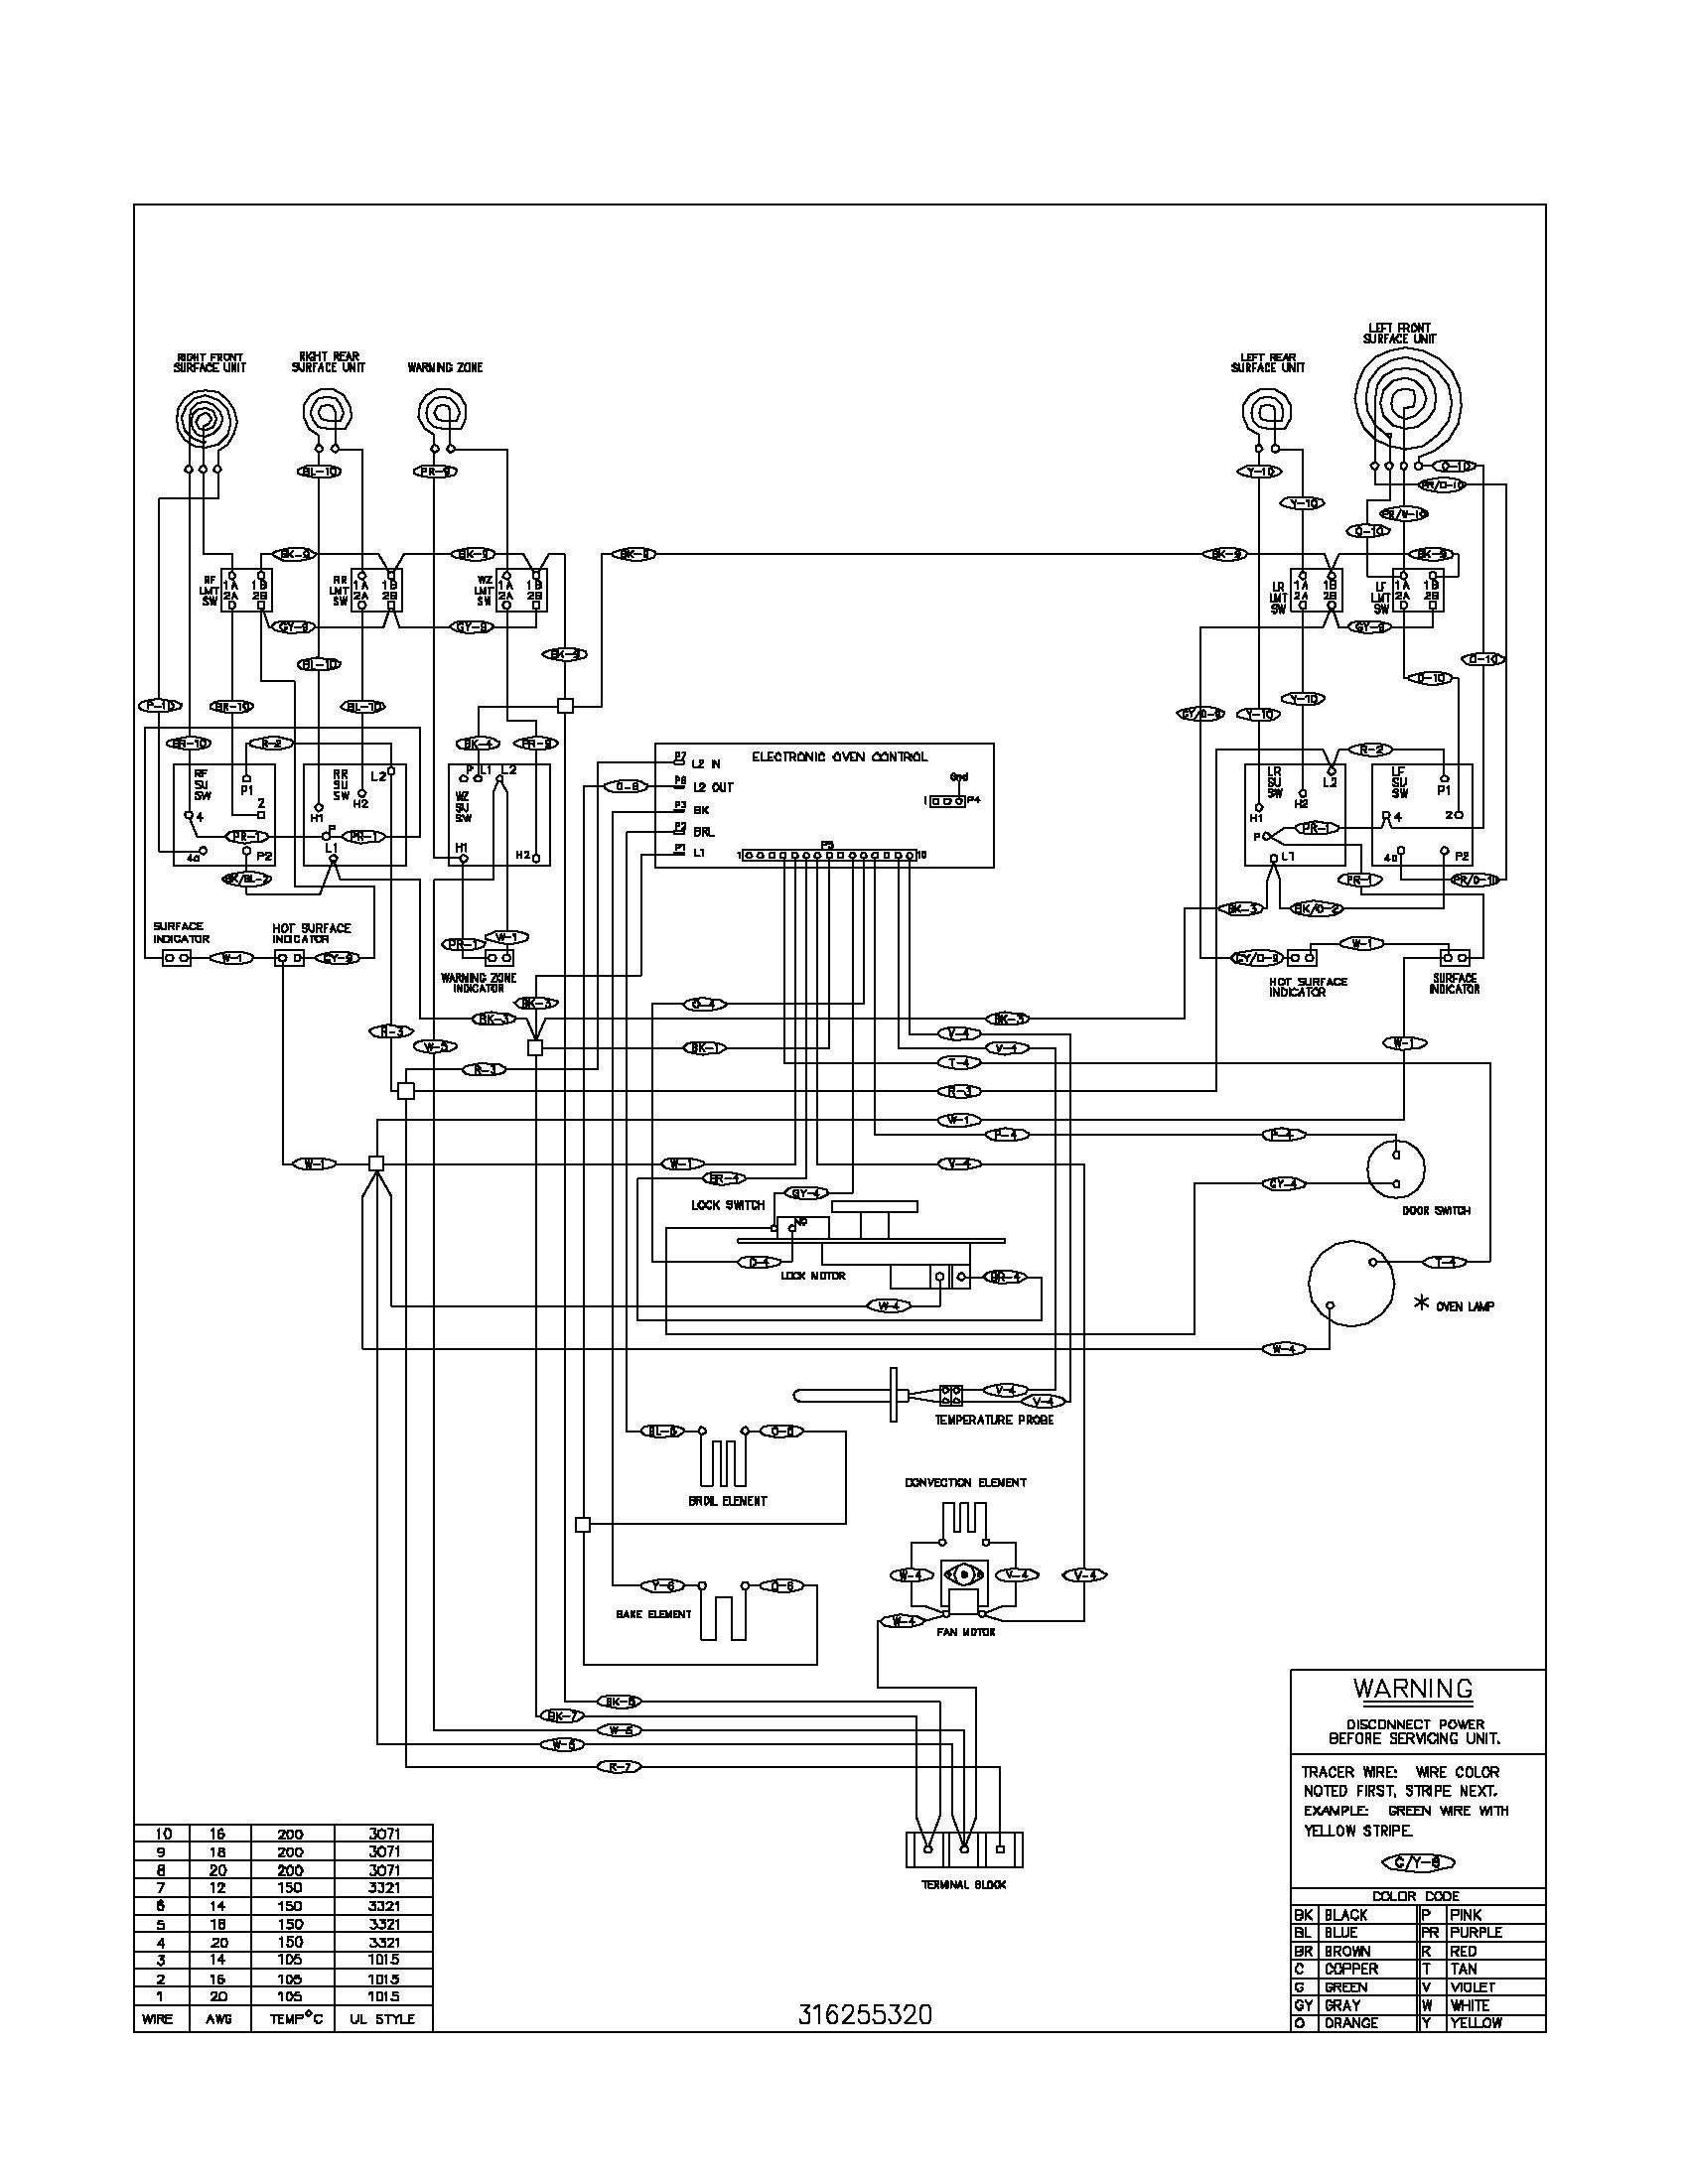 Ge Appliance Wiring Diagrams Ge Refrigerator Wiring Circuit Diagram Wiring Diagram